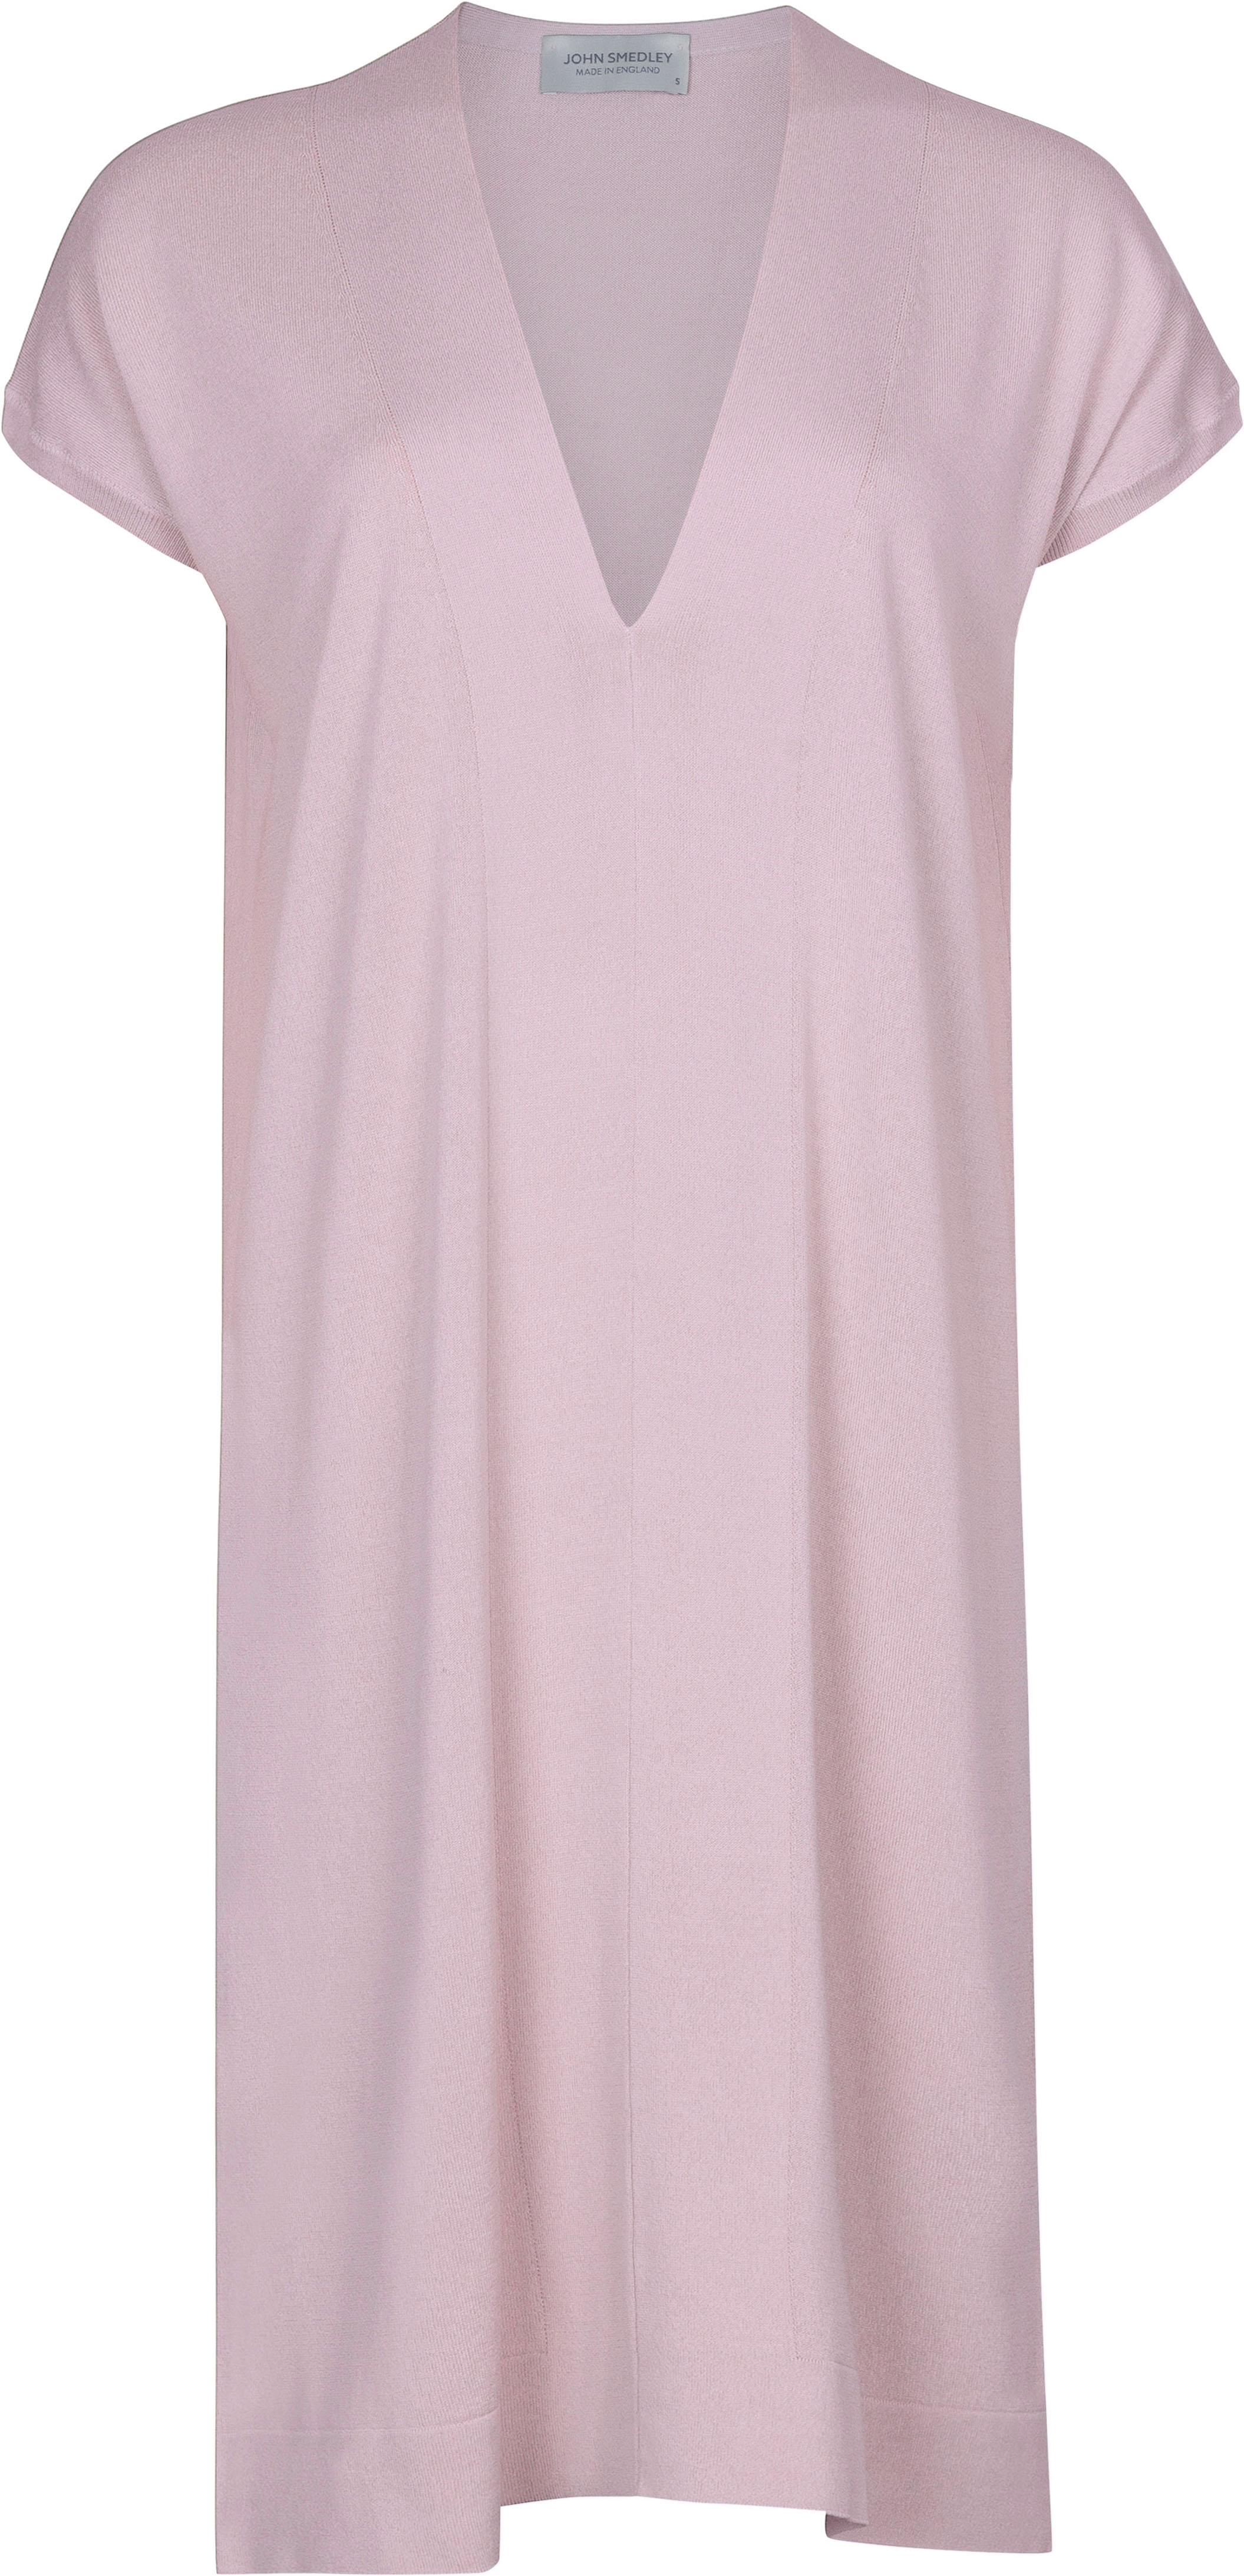 John Smedley Burdine in Pink Blossom Dress-LGE